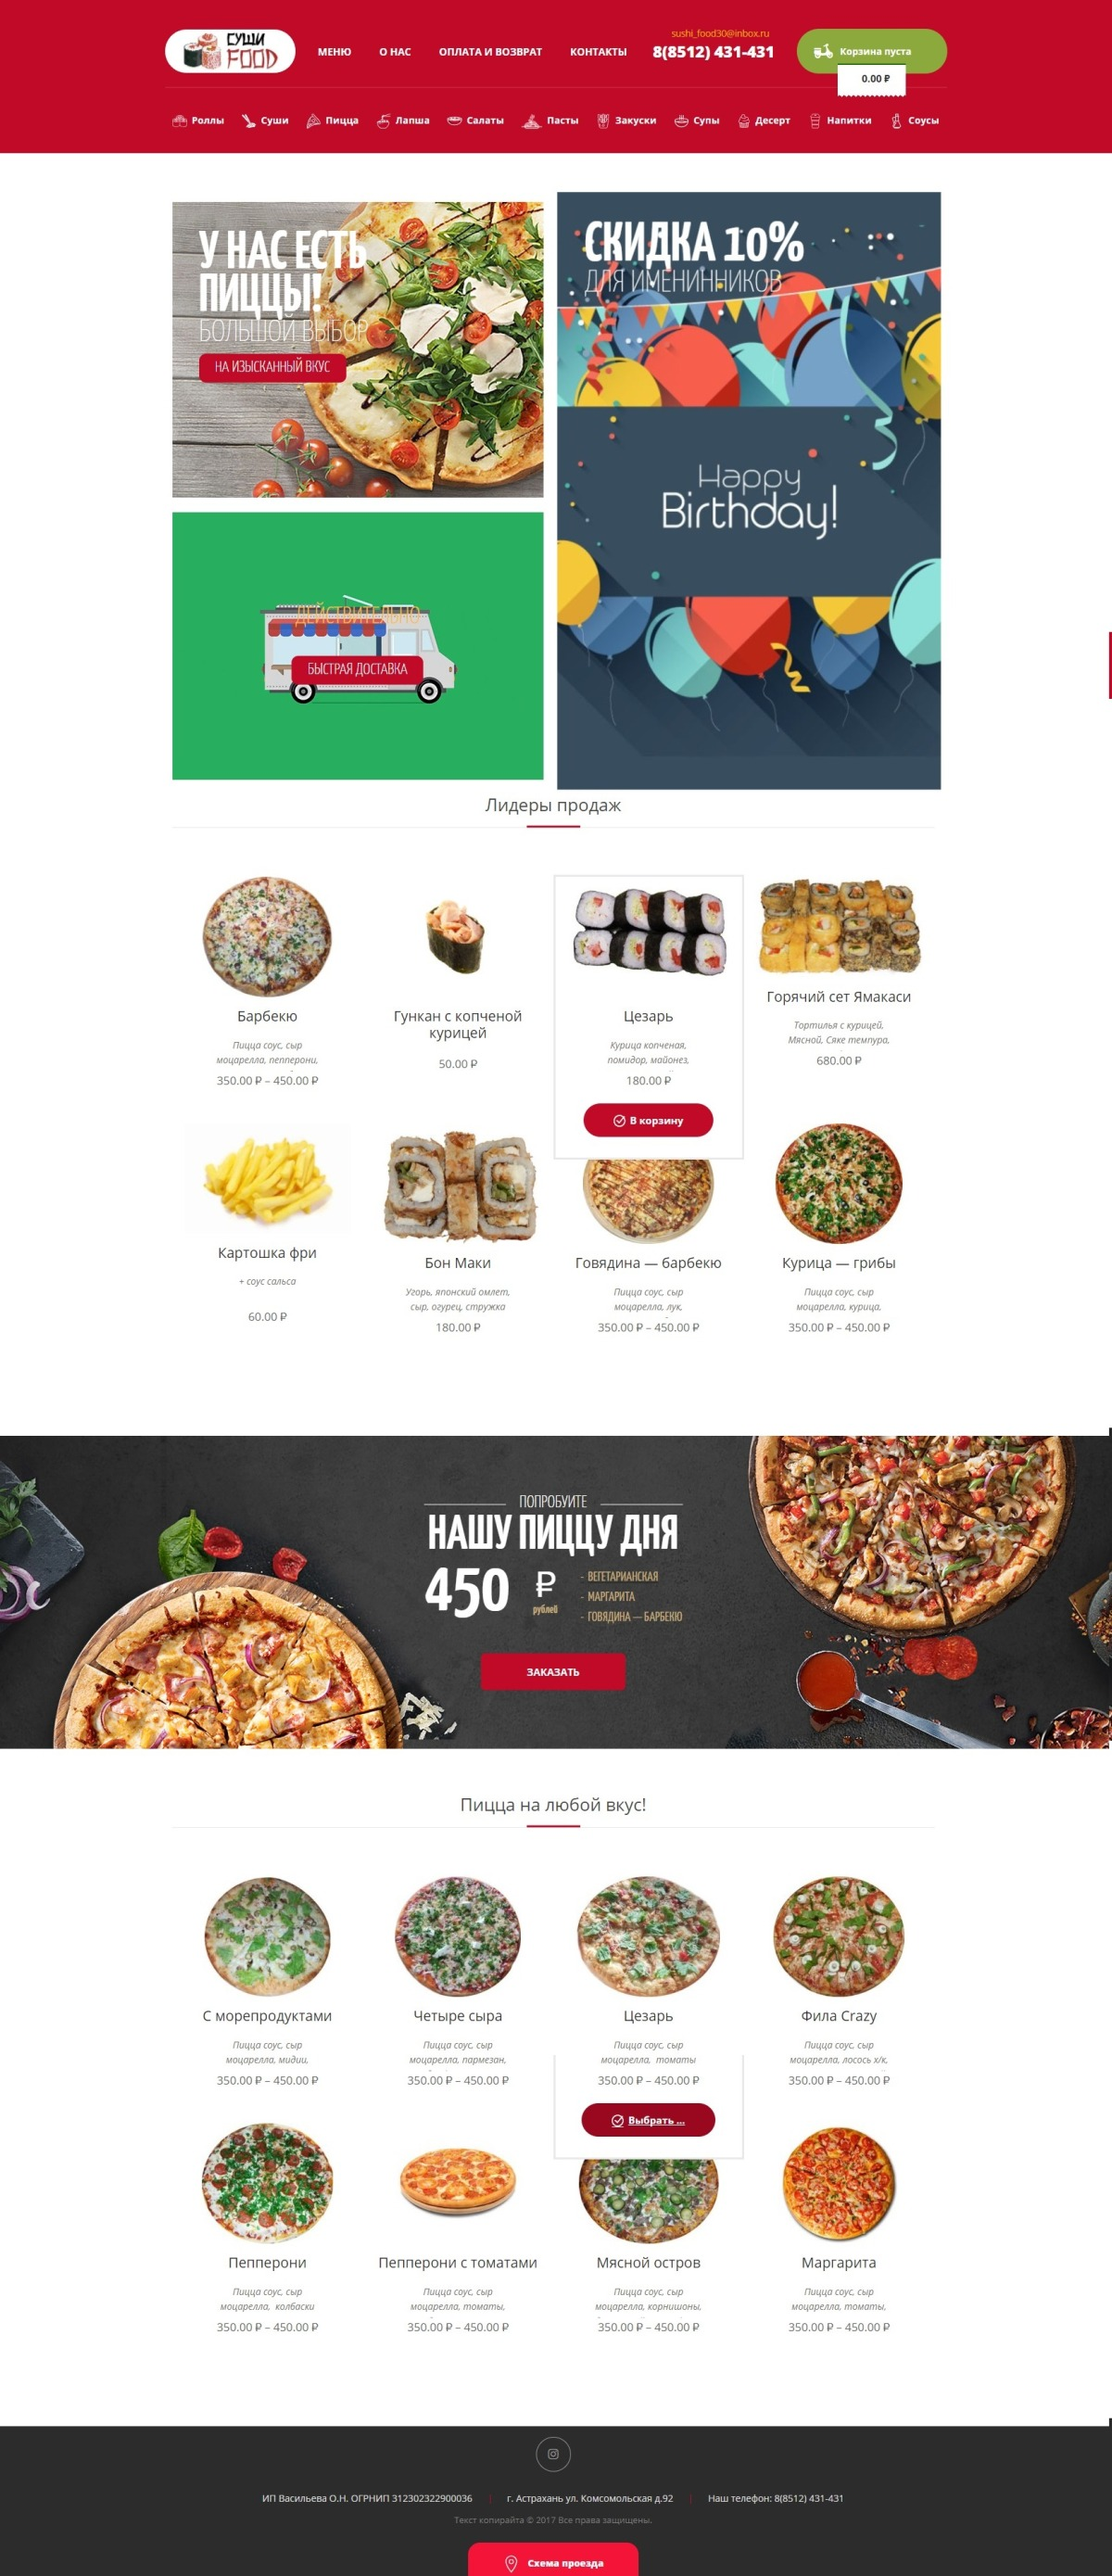 Обновлен дизайн сайта